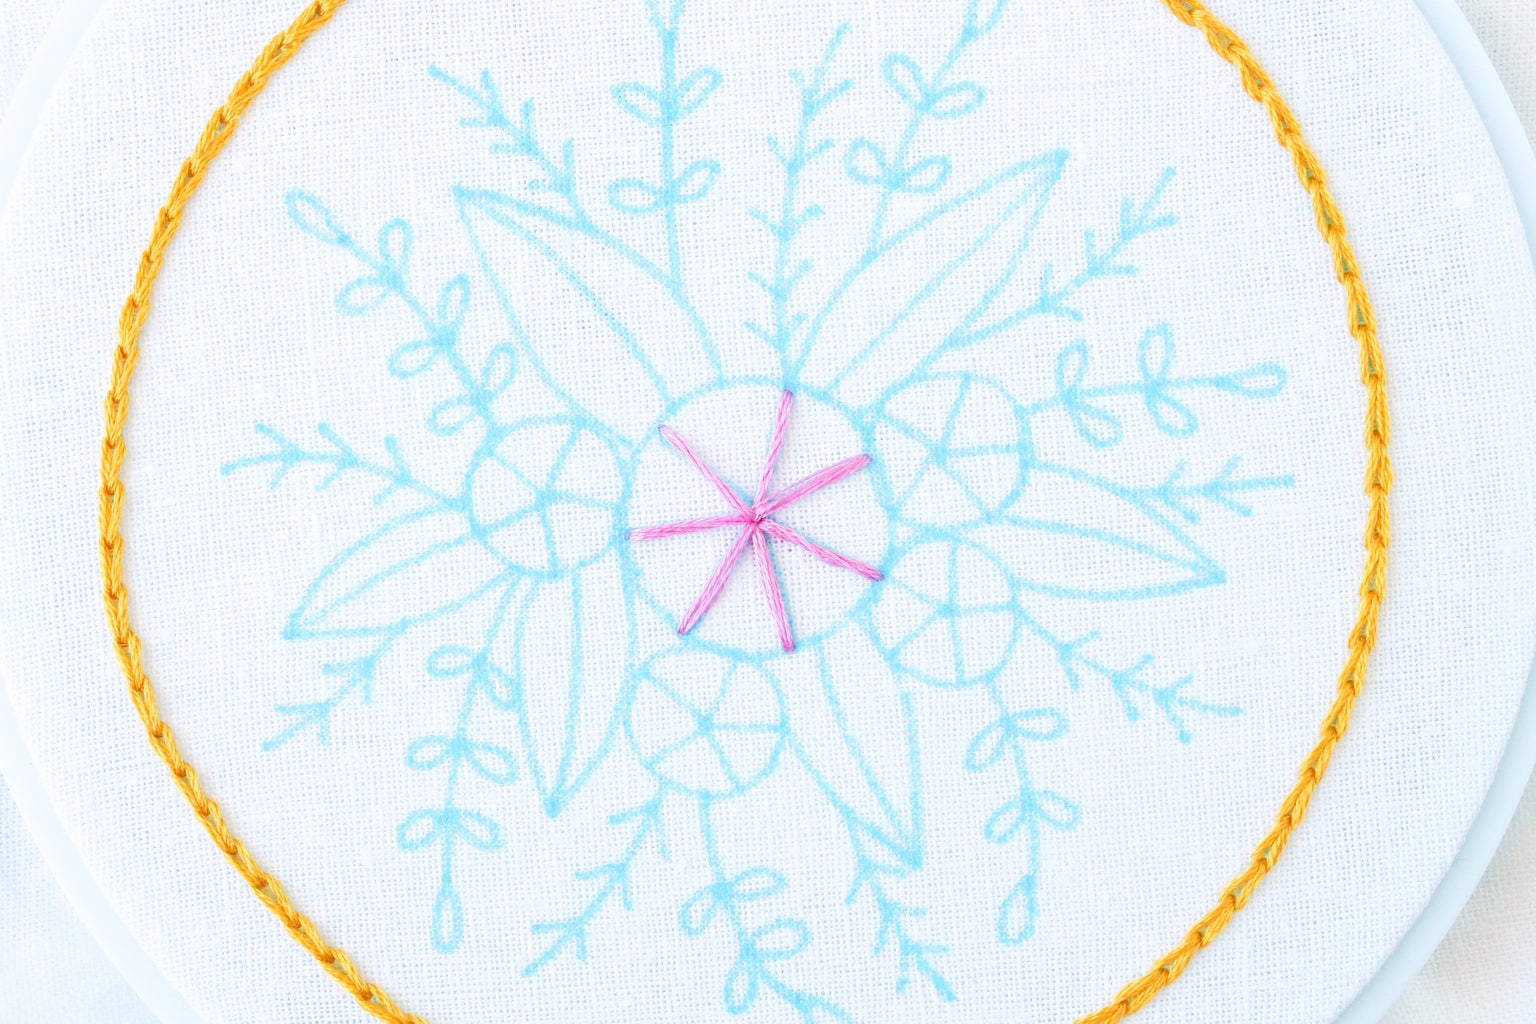 Stitch the Spokes